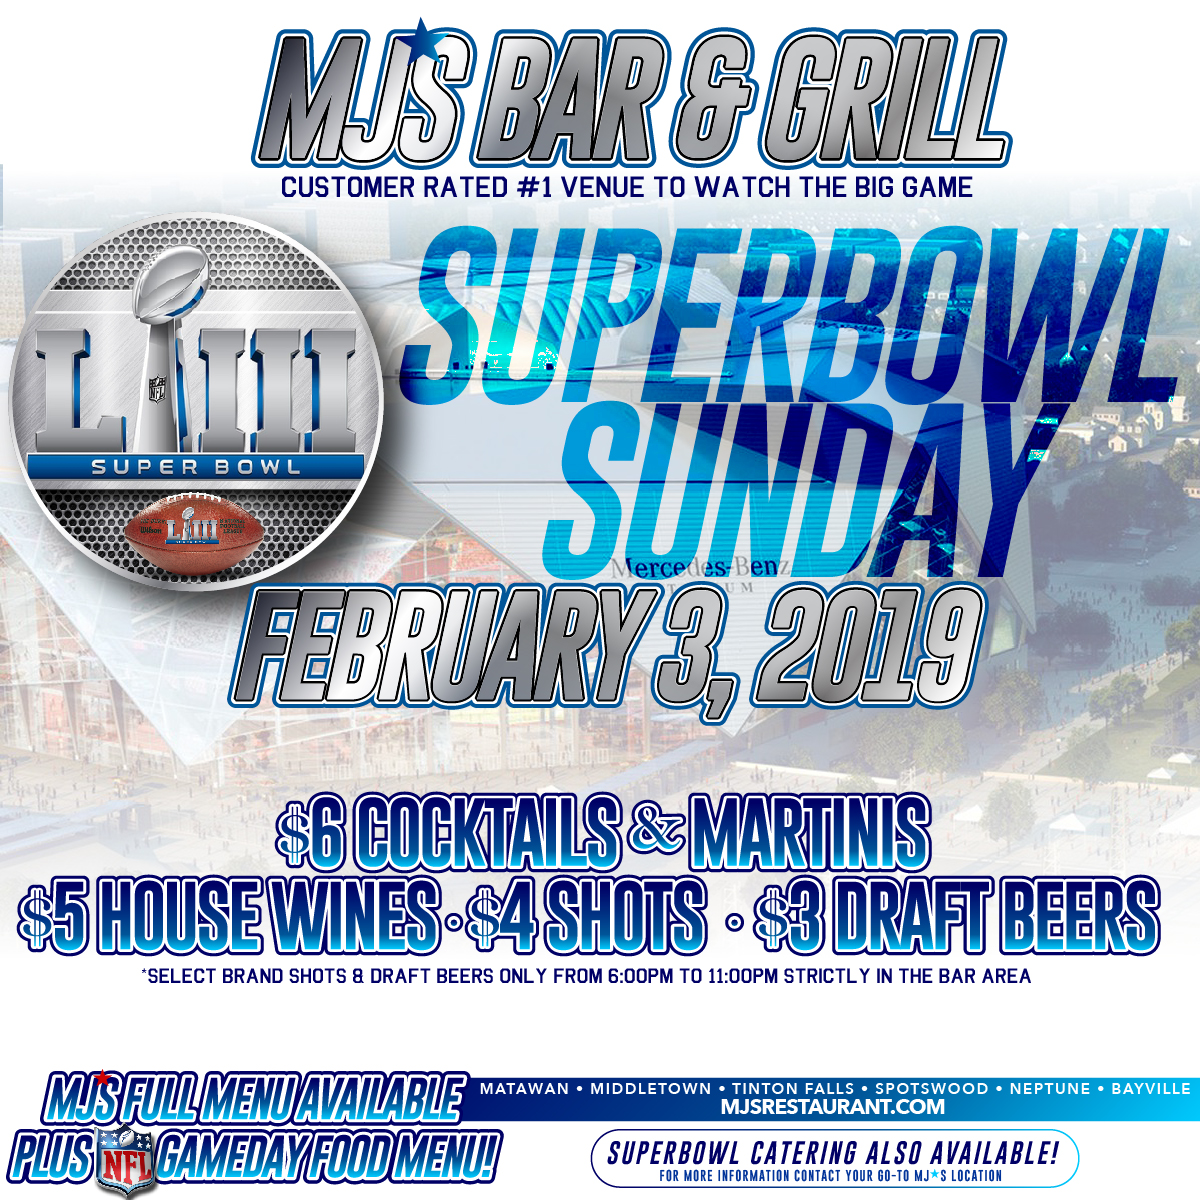 Superbowl Sunday at MJ'S!